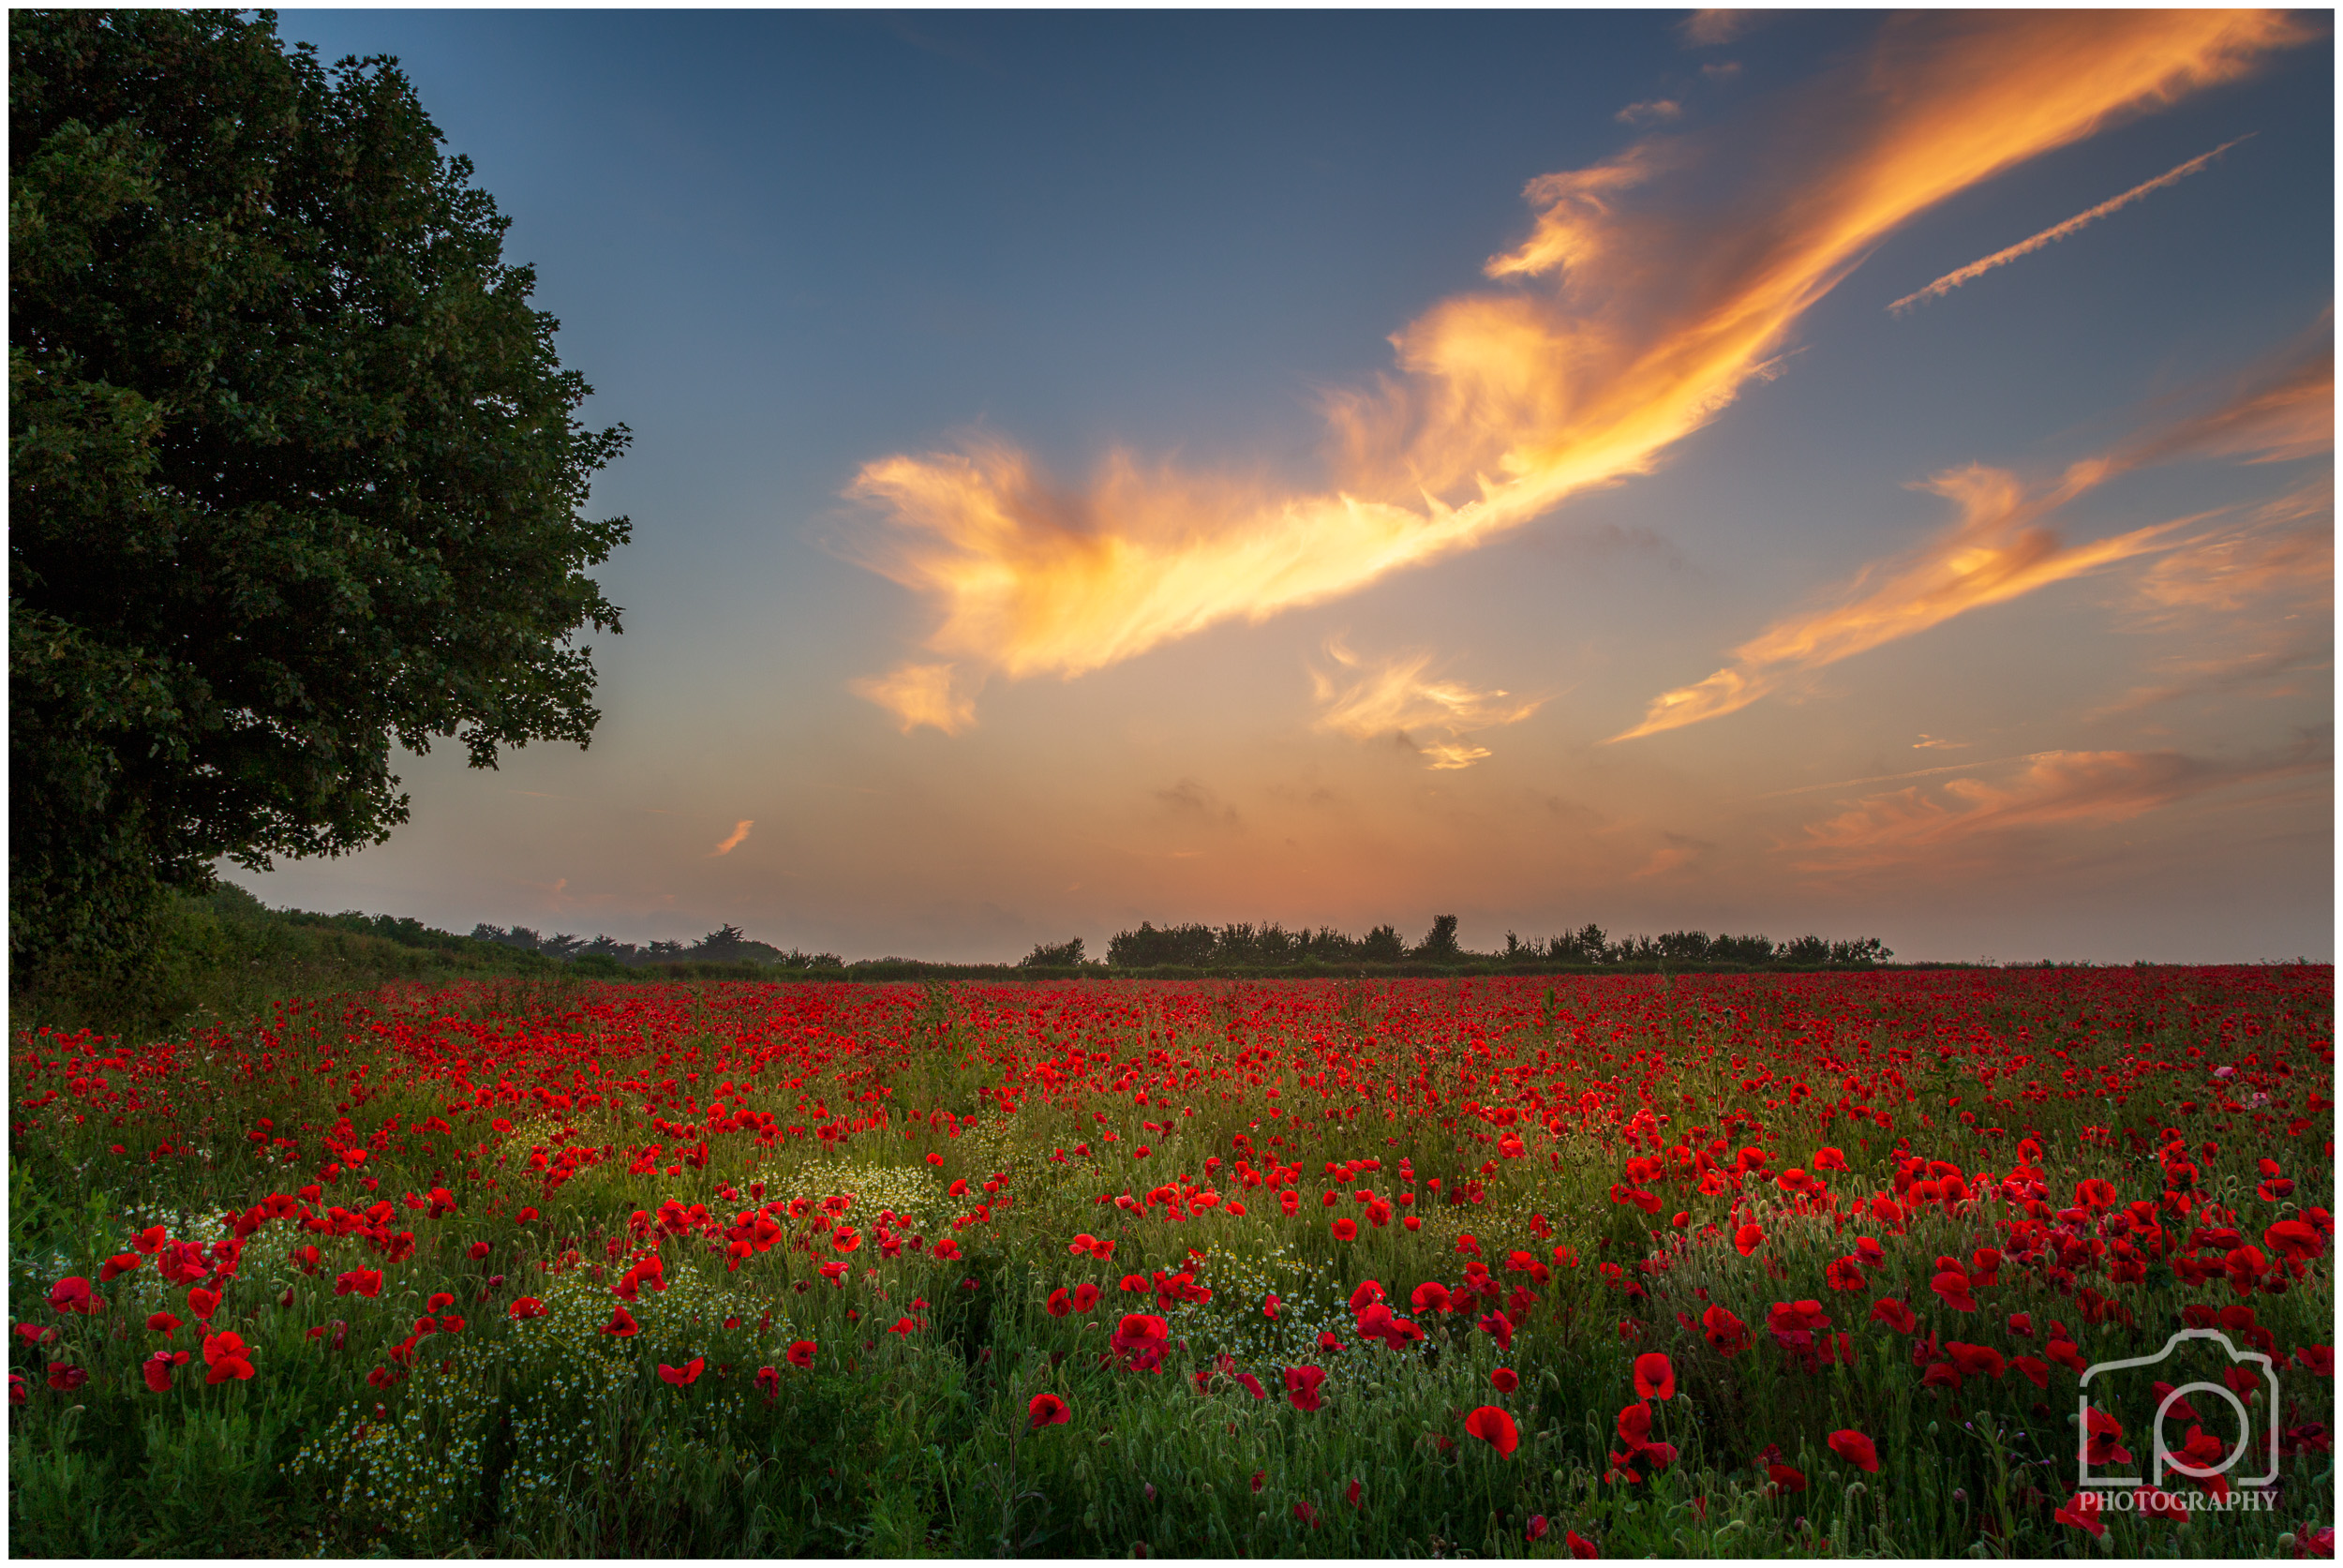 Pineham Poppies at Sunset